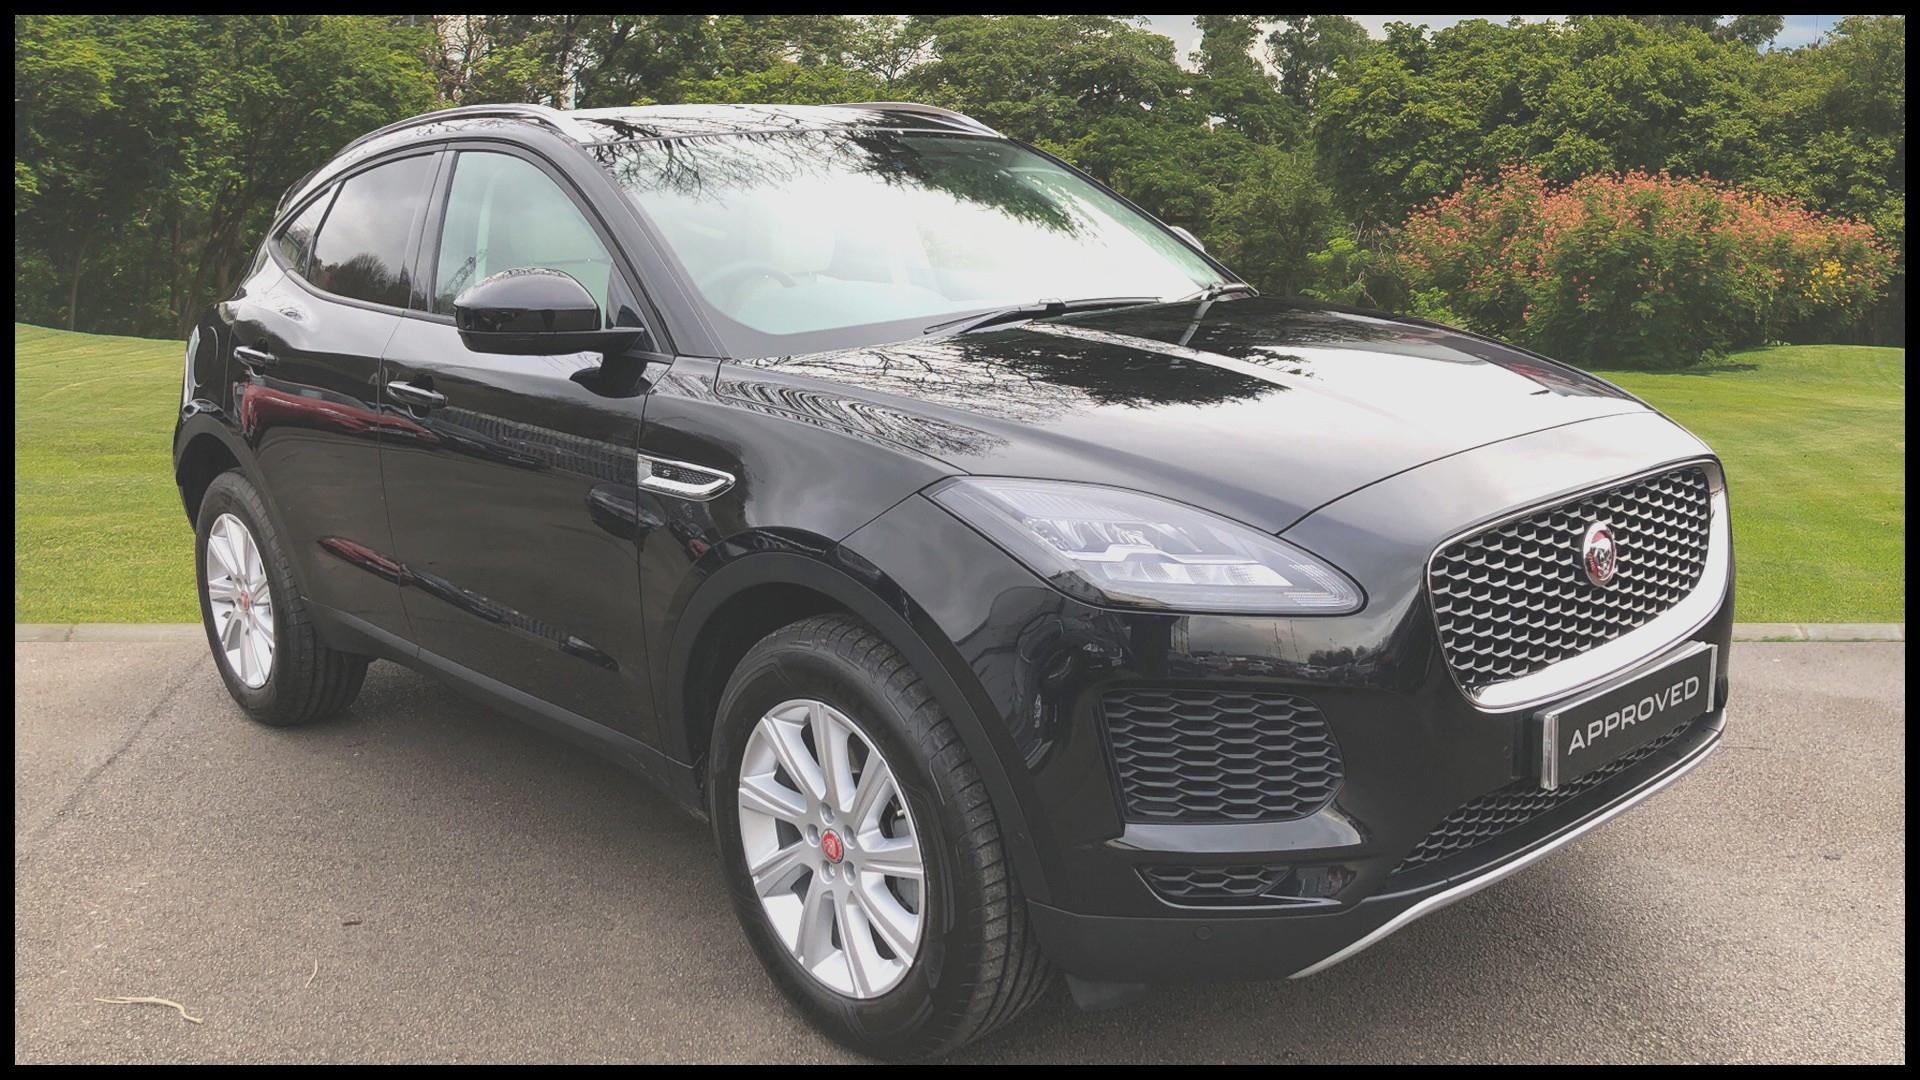 Audi Used Cars for Sale Beautiful Audi Usa Careers Luxury Used Jaguar E Pace 2 0d